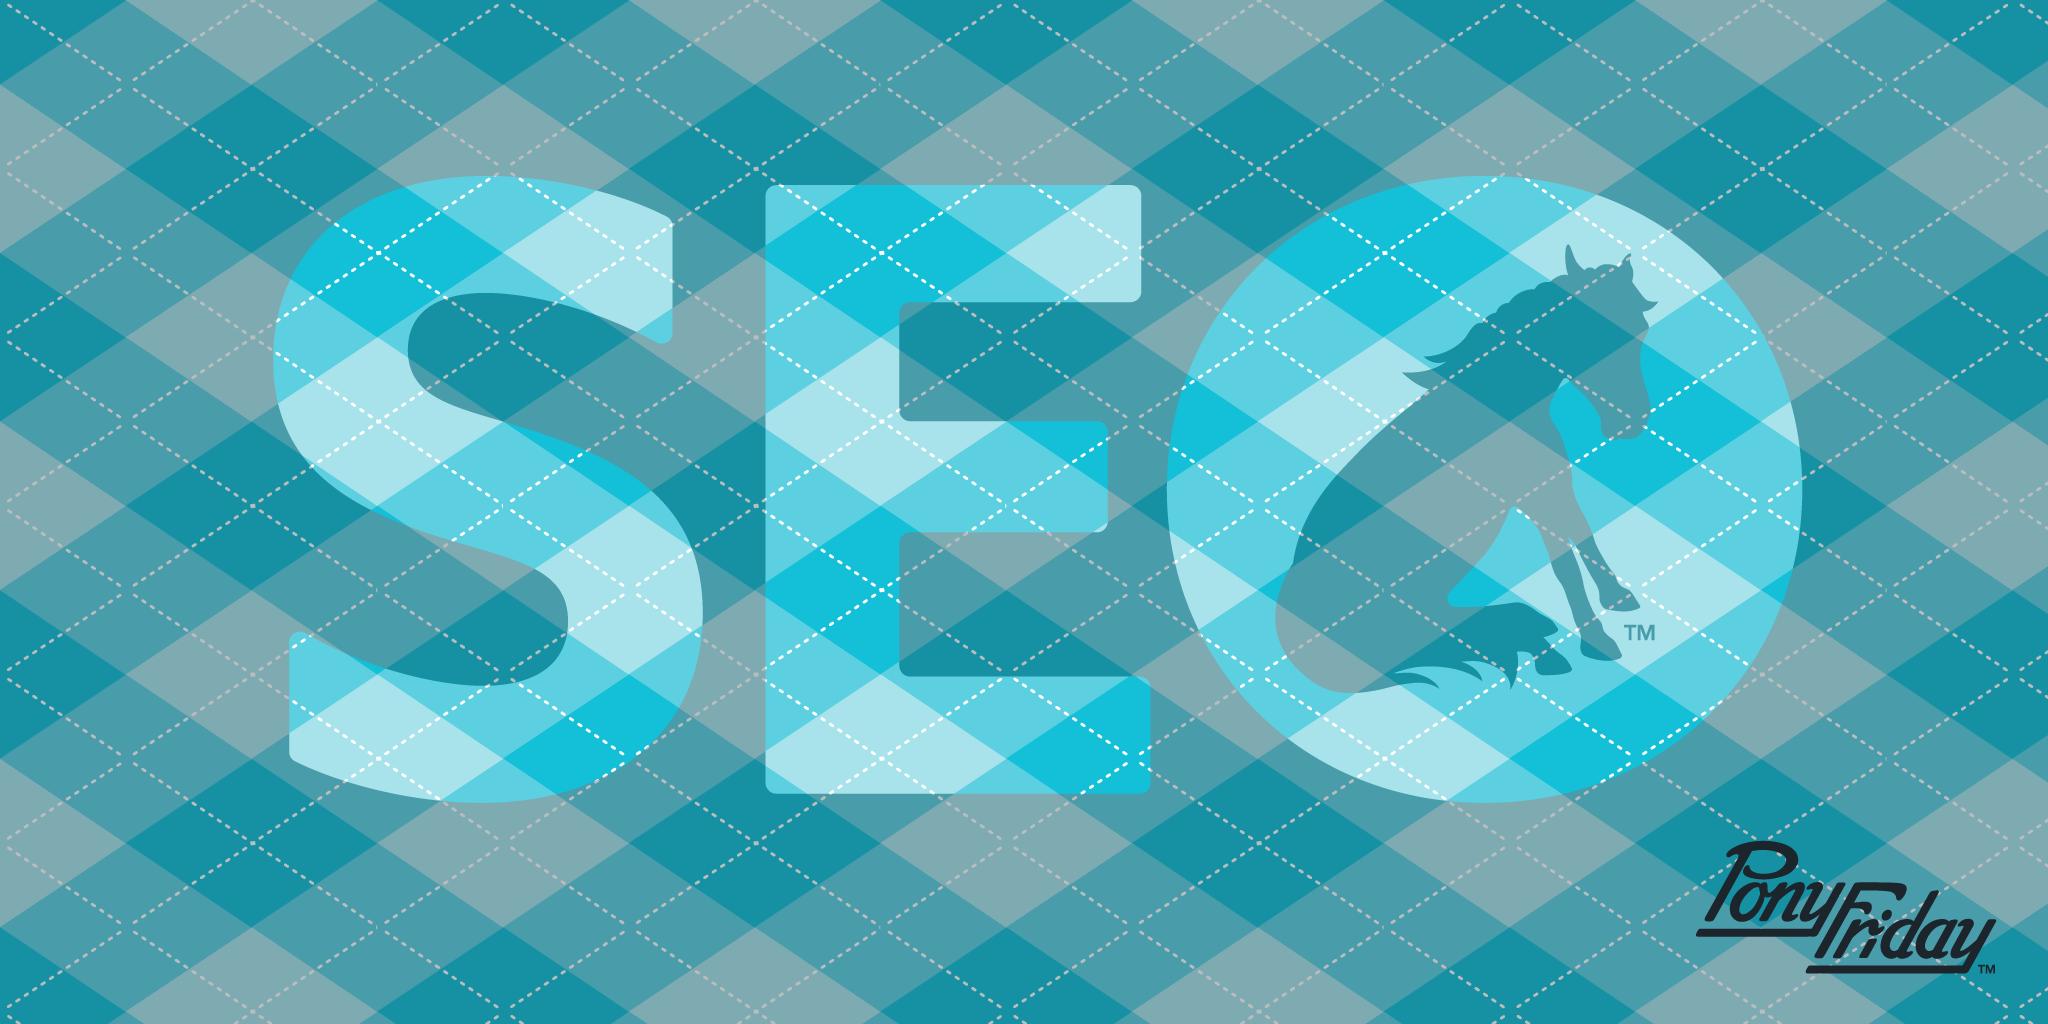 Pony-Friday-SEO-Plaid-Search-Engine-Optimization-Blog-Header.png